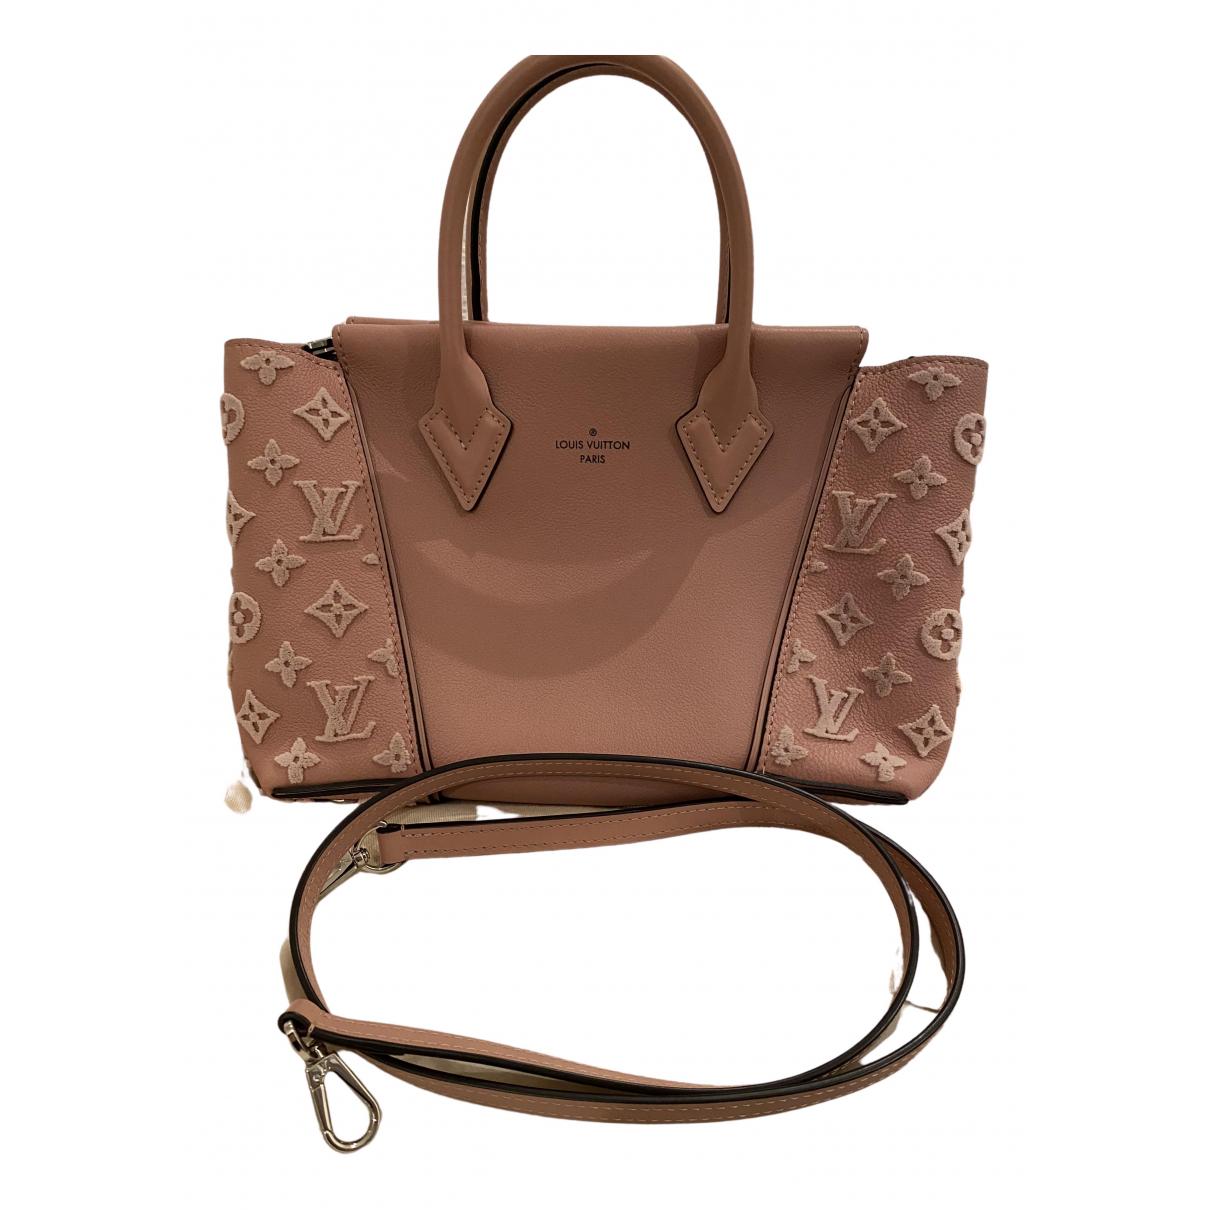 Louis Vuitton - Sac a main   pour femme en cuir - rose